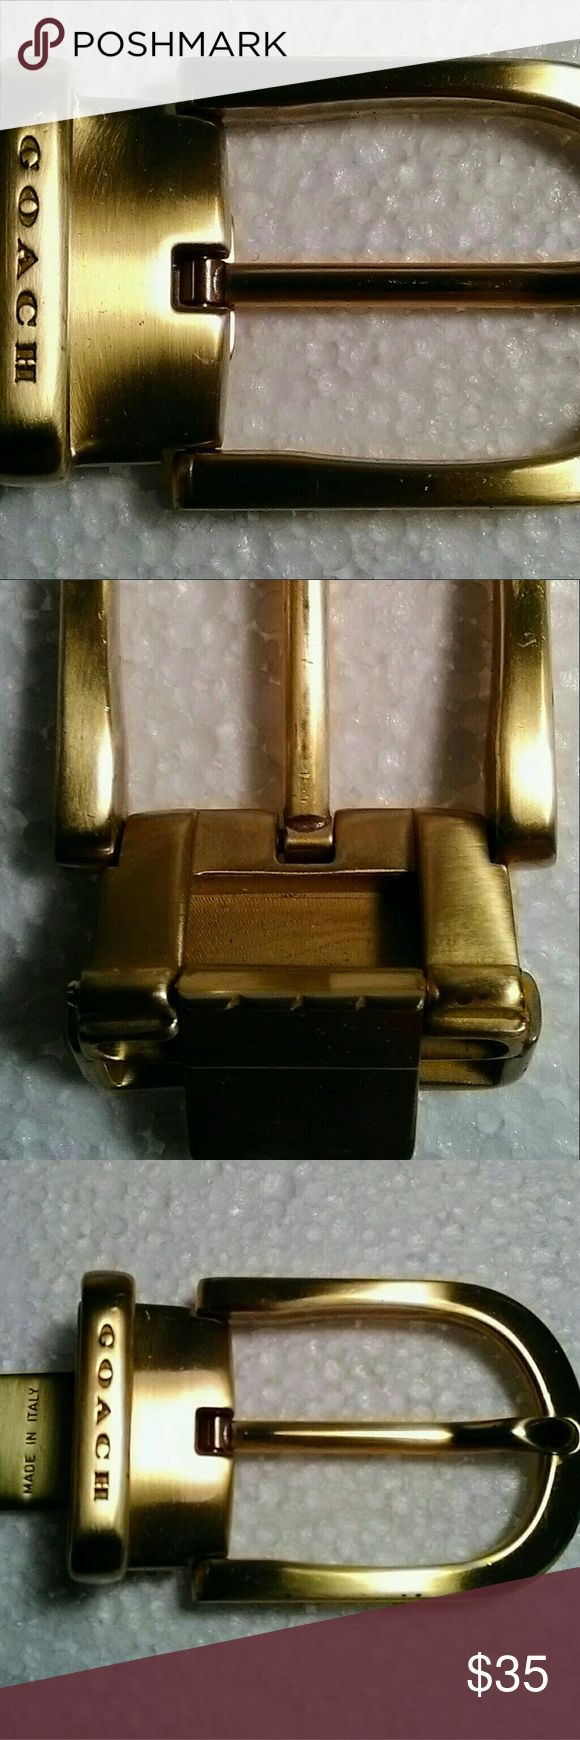 Coach belt buckle Authentic coach brass buckle Coach Other